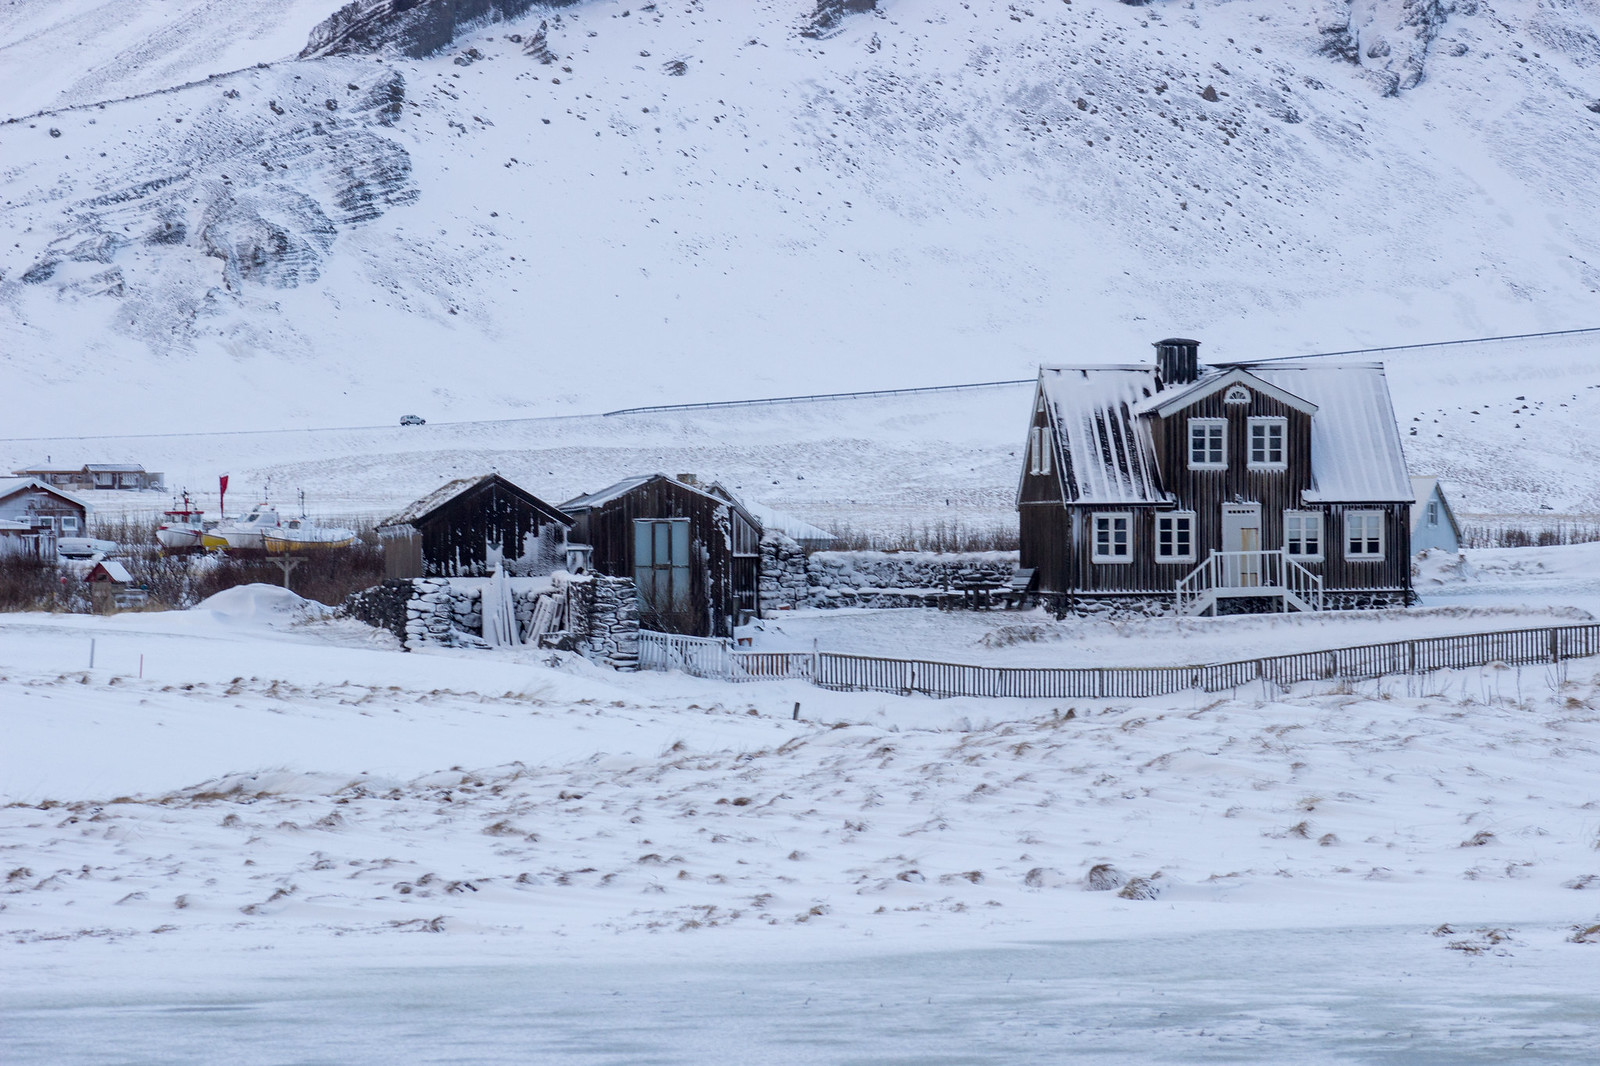 A house in front of Snaefellsjokull, Snaefellsnes Peninsula